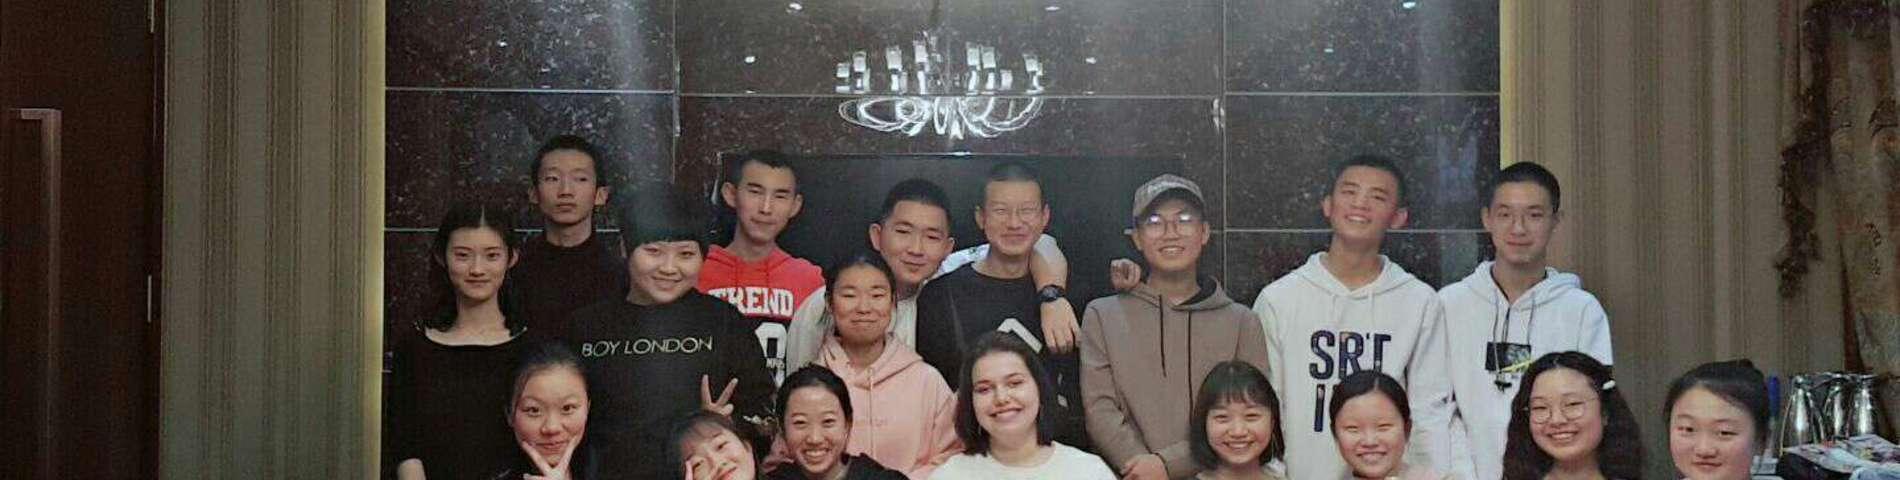 LTL Mandarin School kép 1